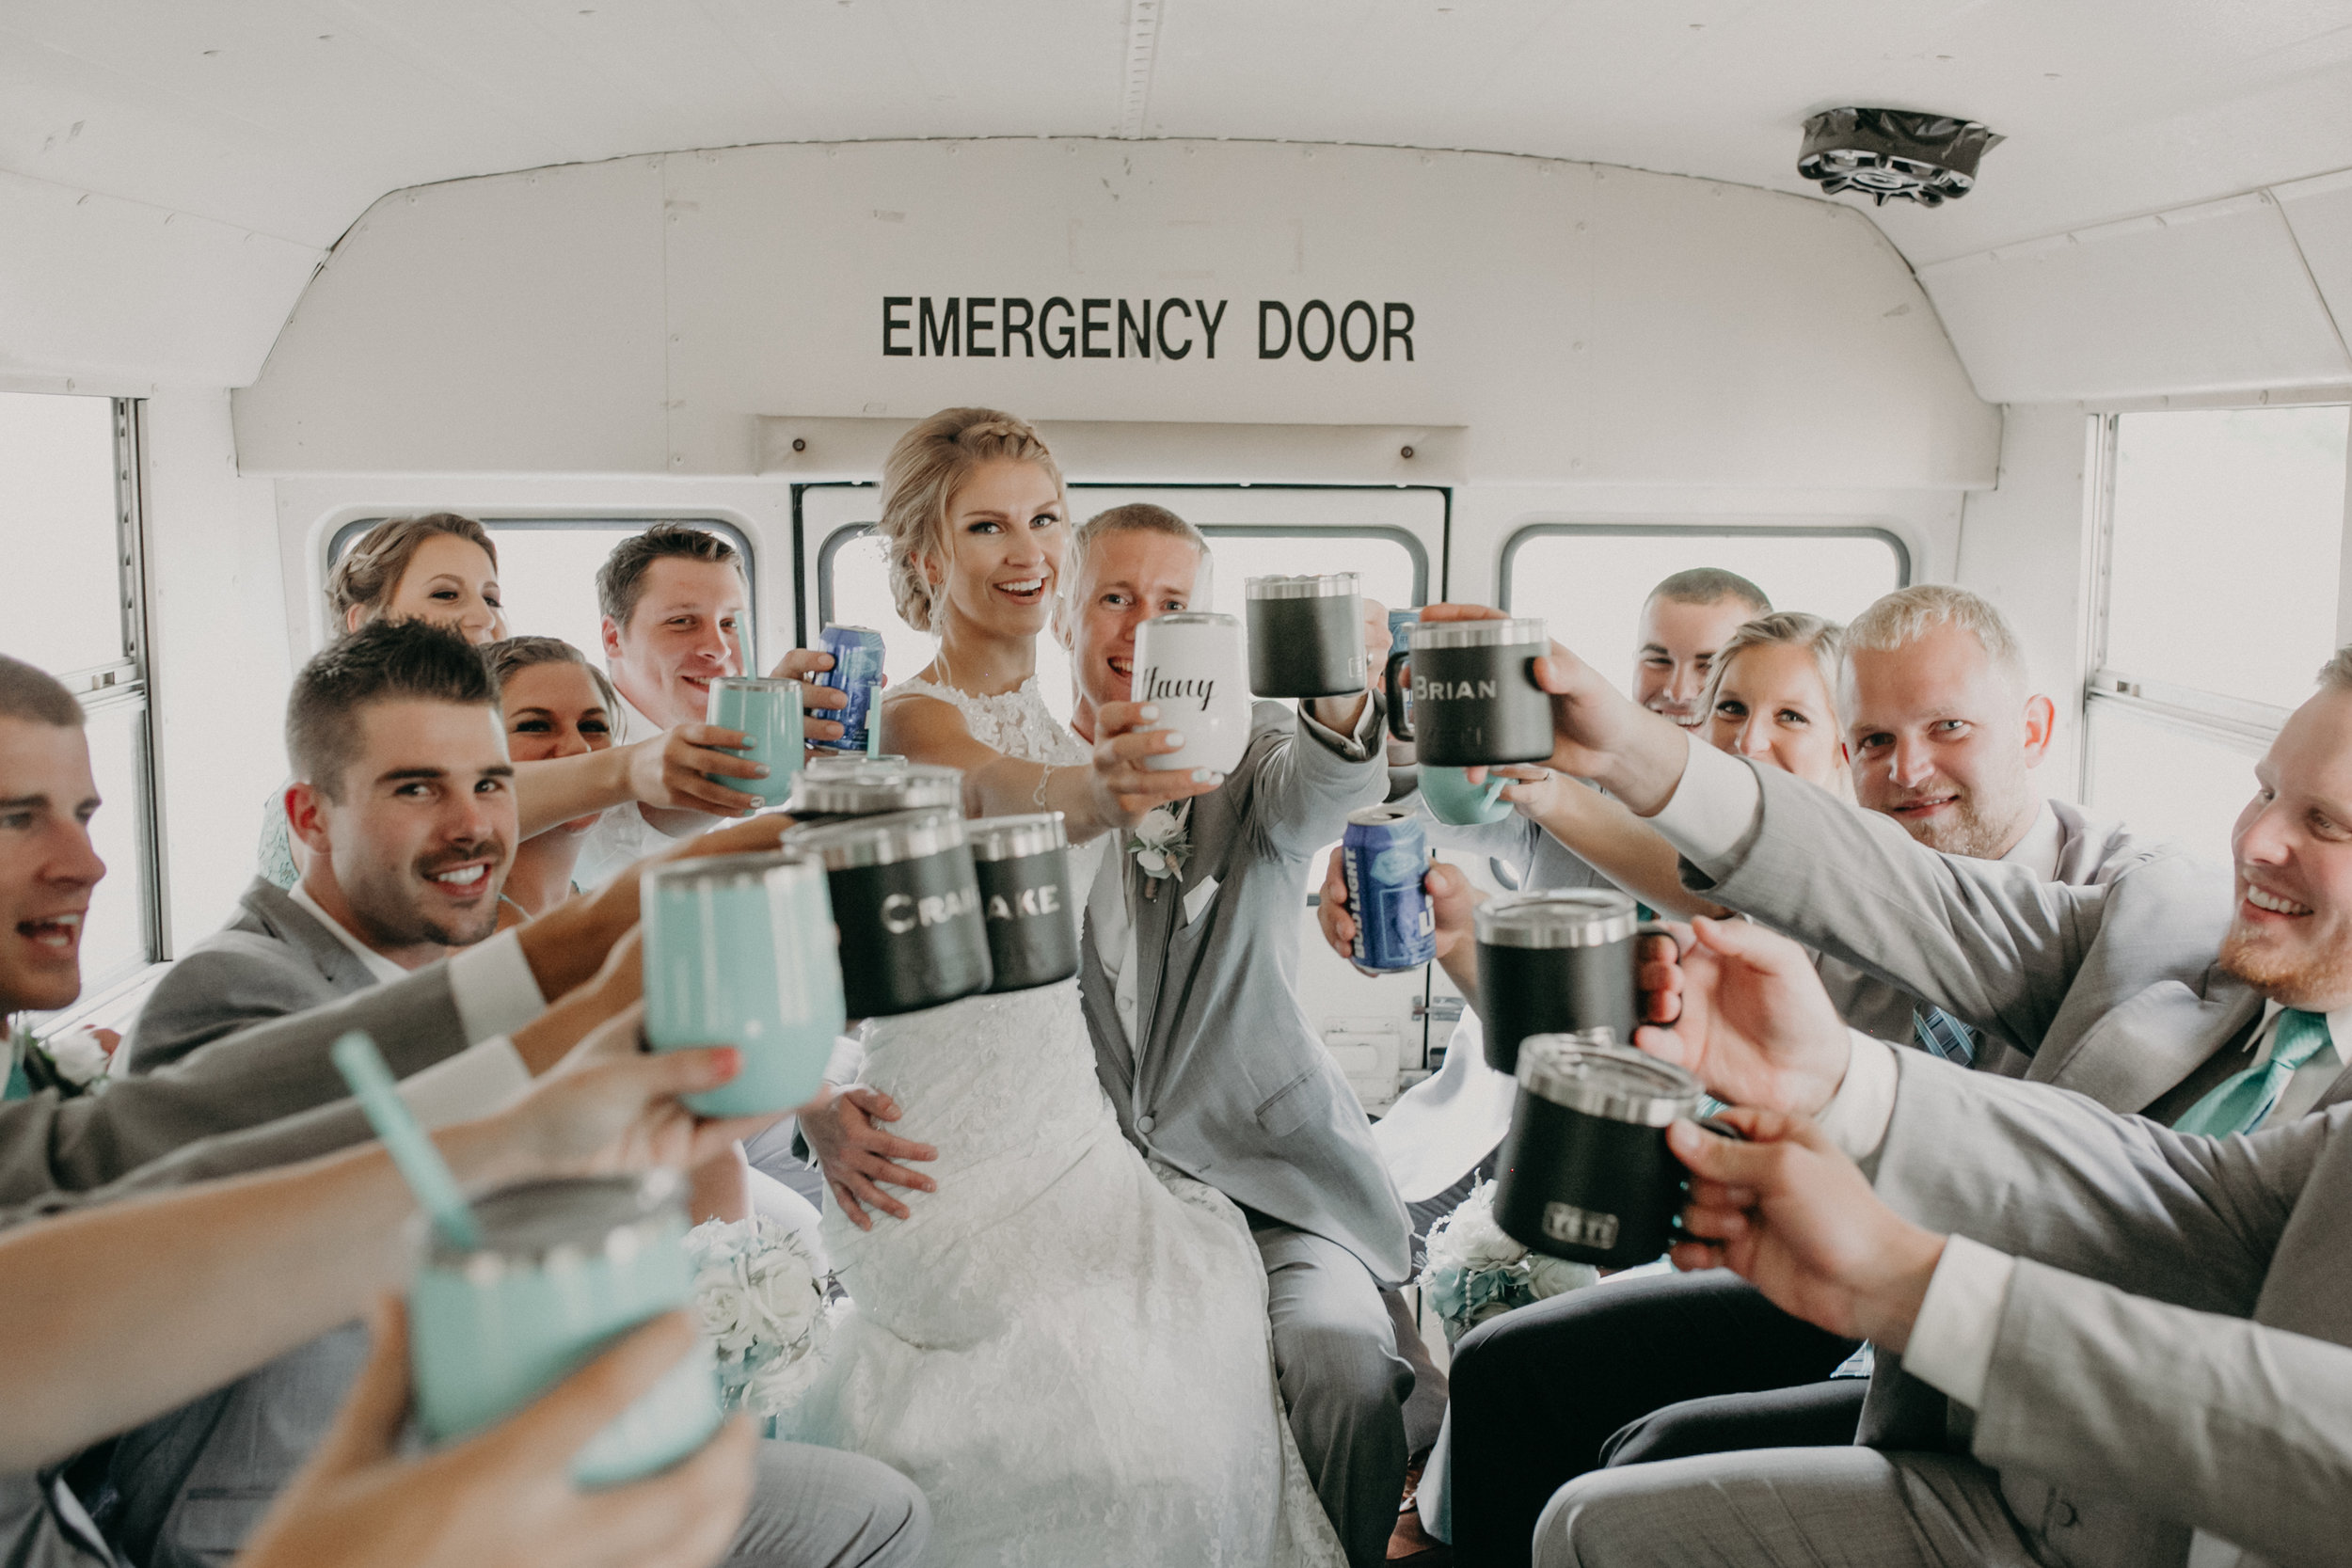 lenz-stargardt-wedding-chili-corners-bar-party-bus-marshfield